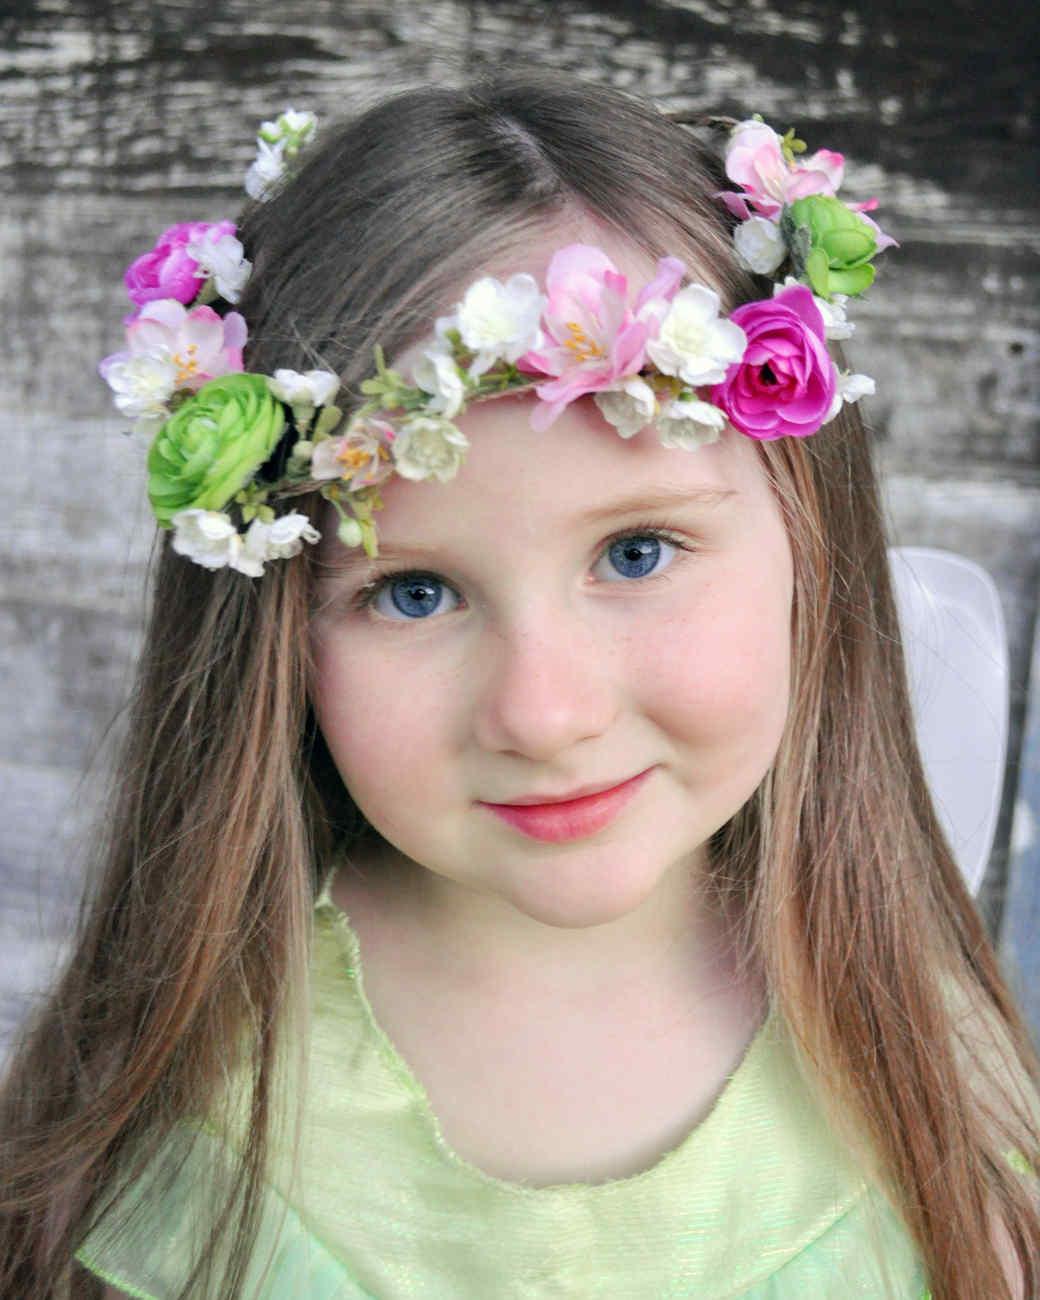 floral-crown-make-life-lovely-01-0814.jpg